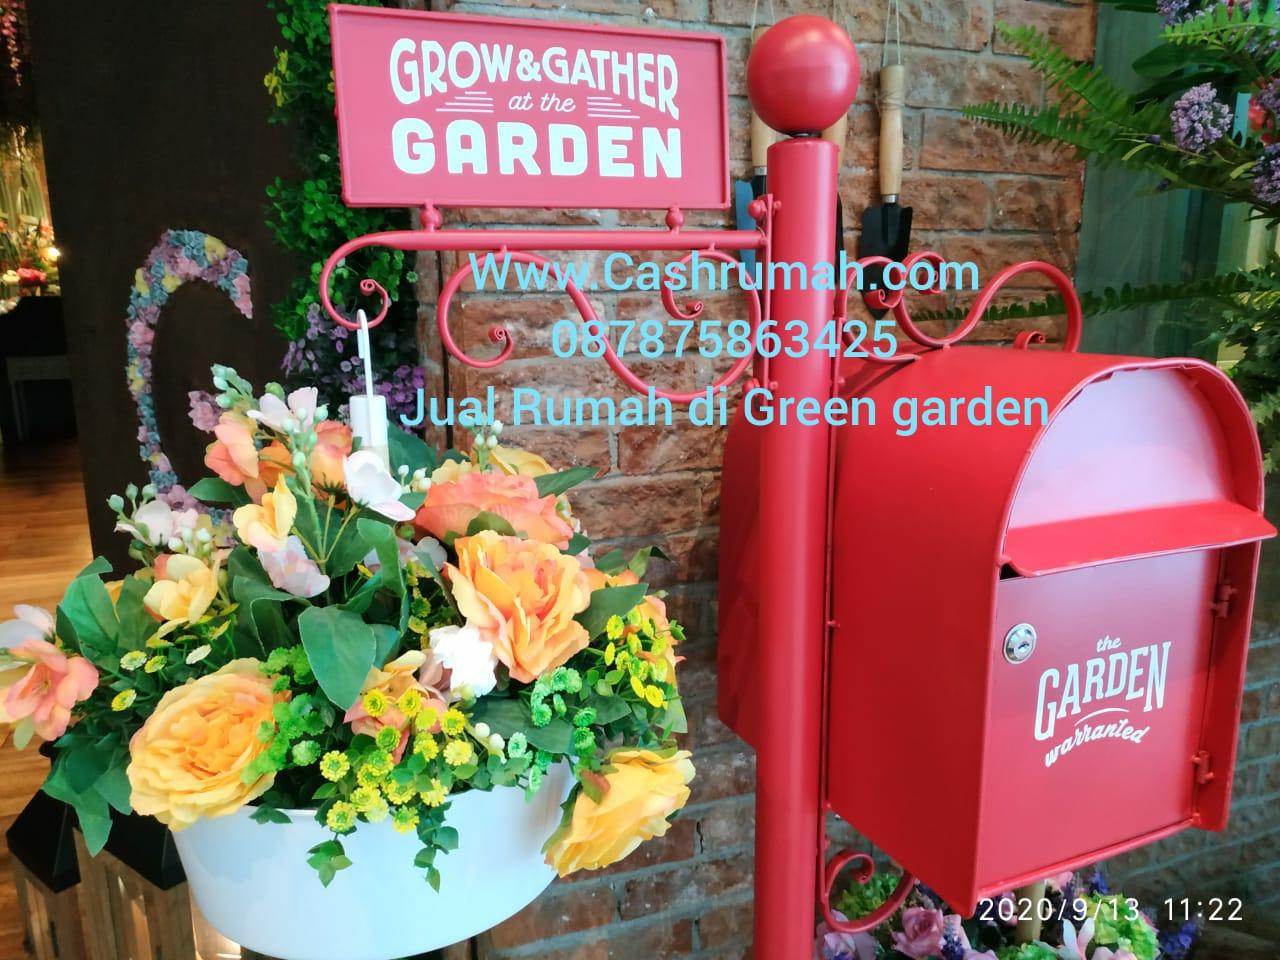 Jual Rumah Cashrumah Green Garden Jakarta Barat 087875863425